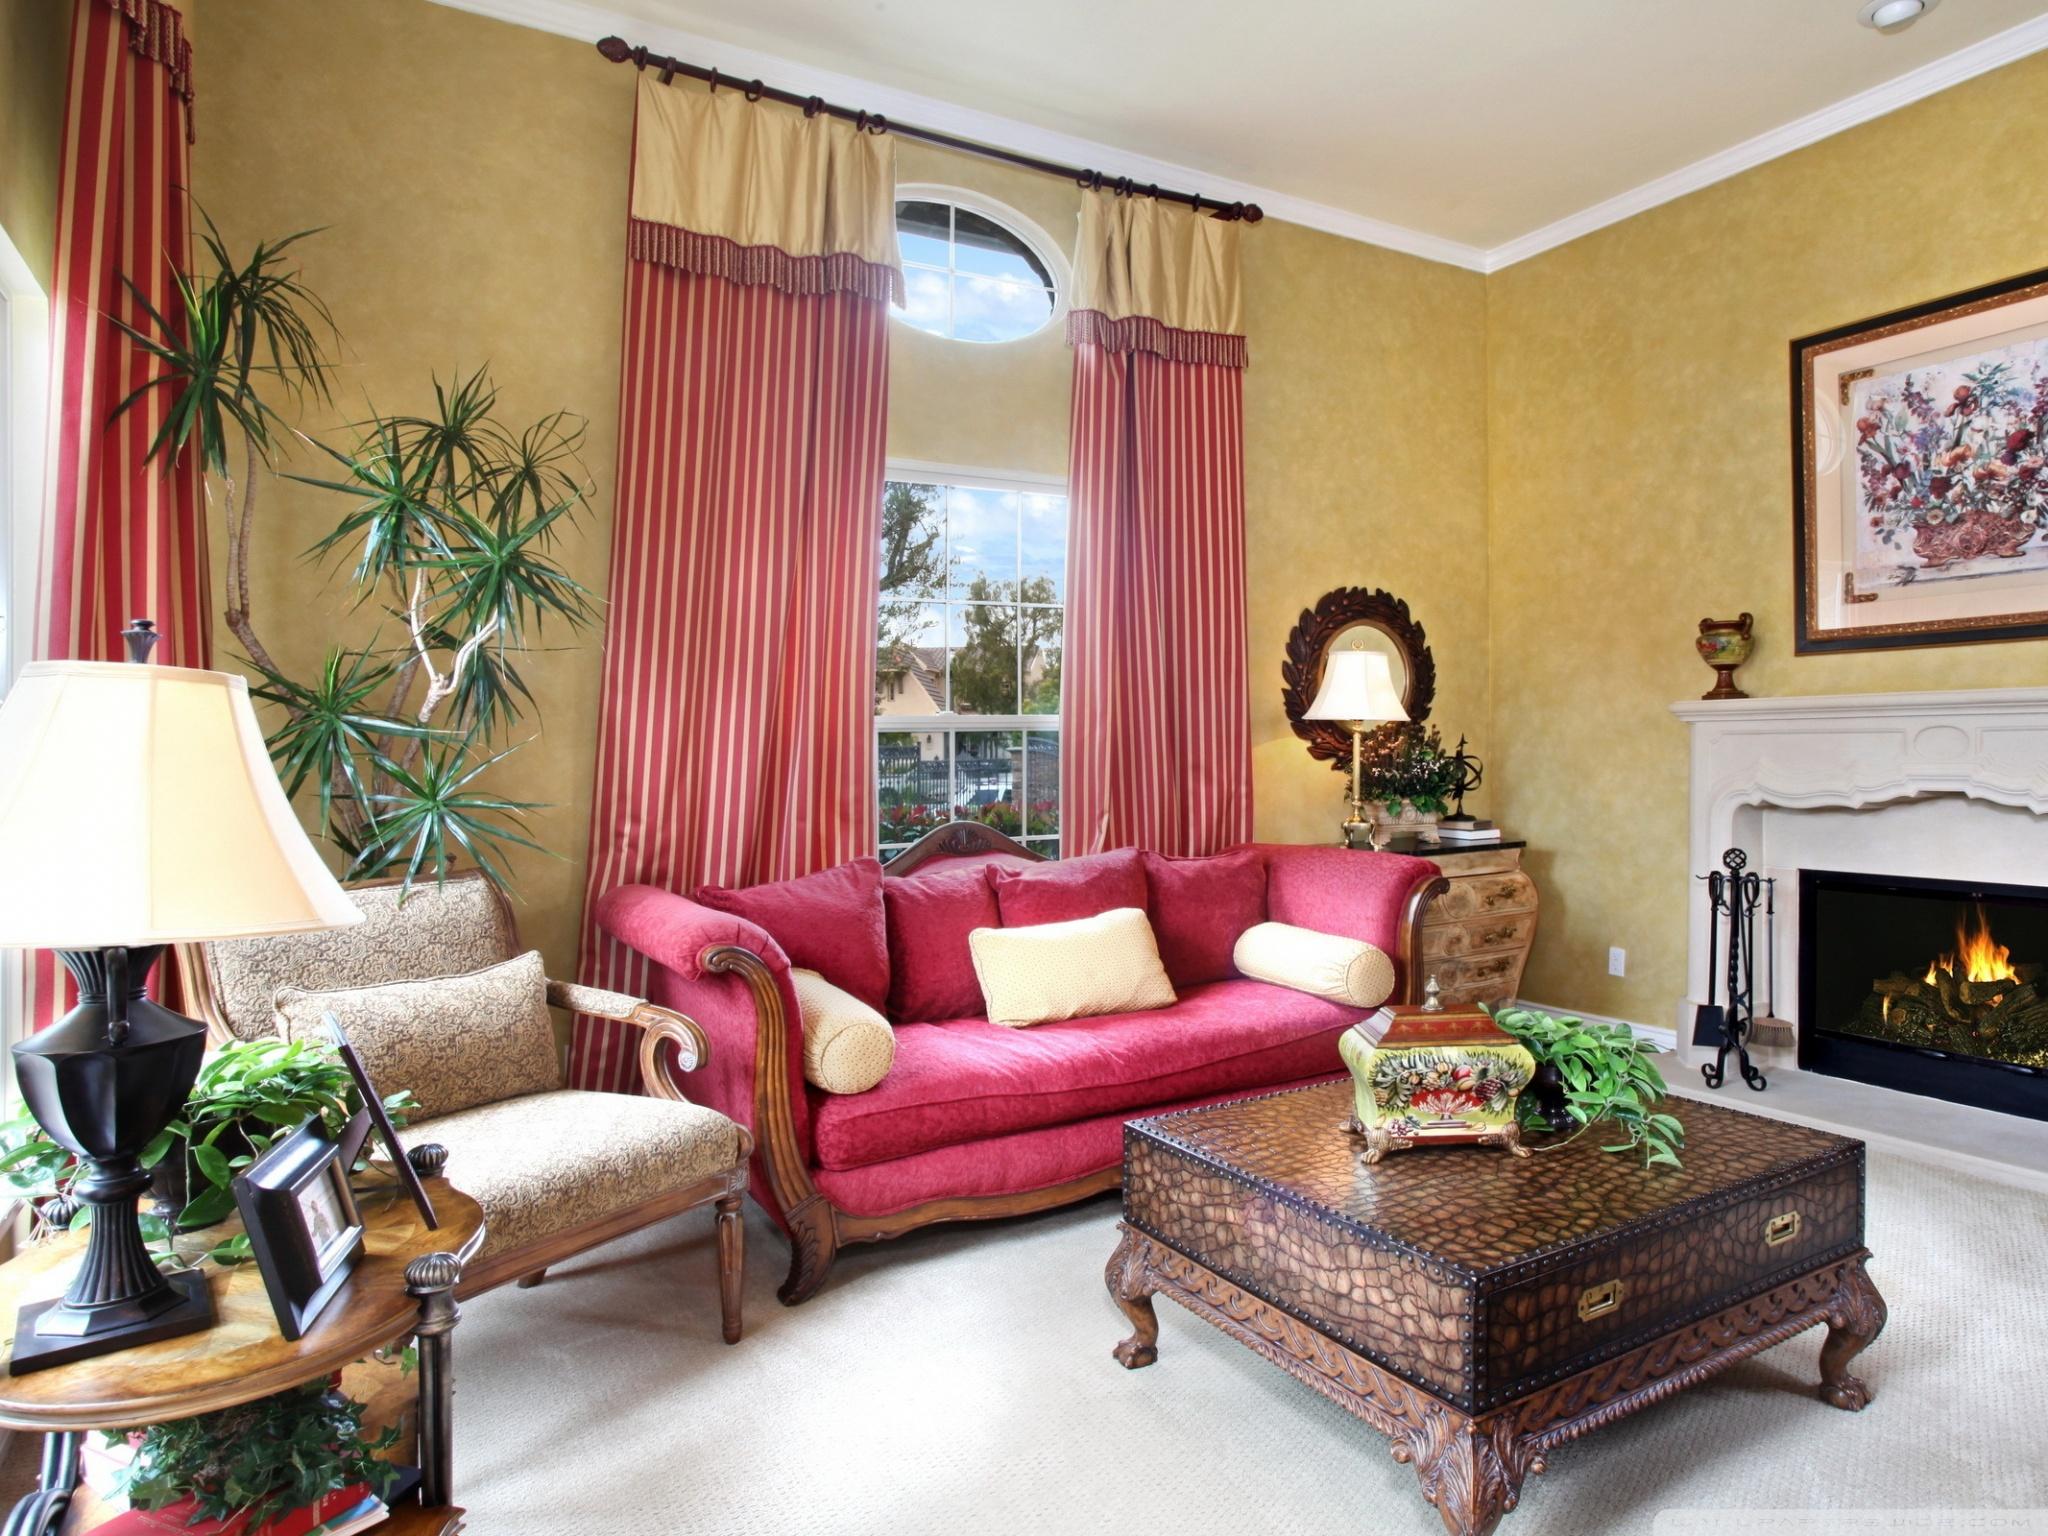 Victorian_style_interior_wallpaper.jpg